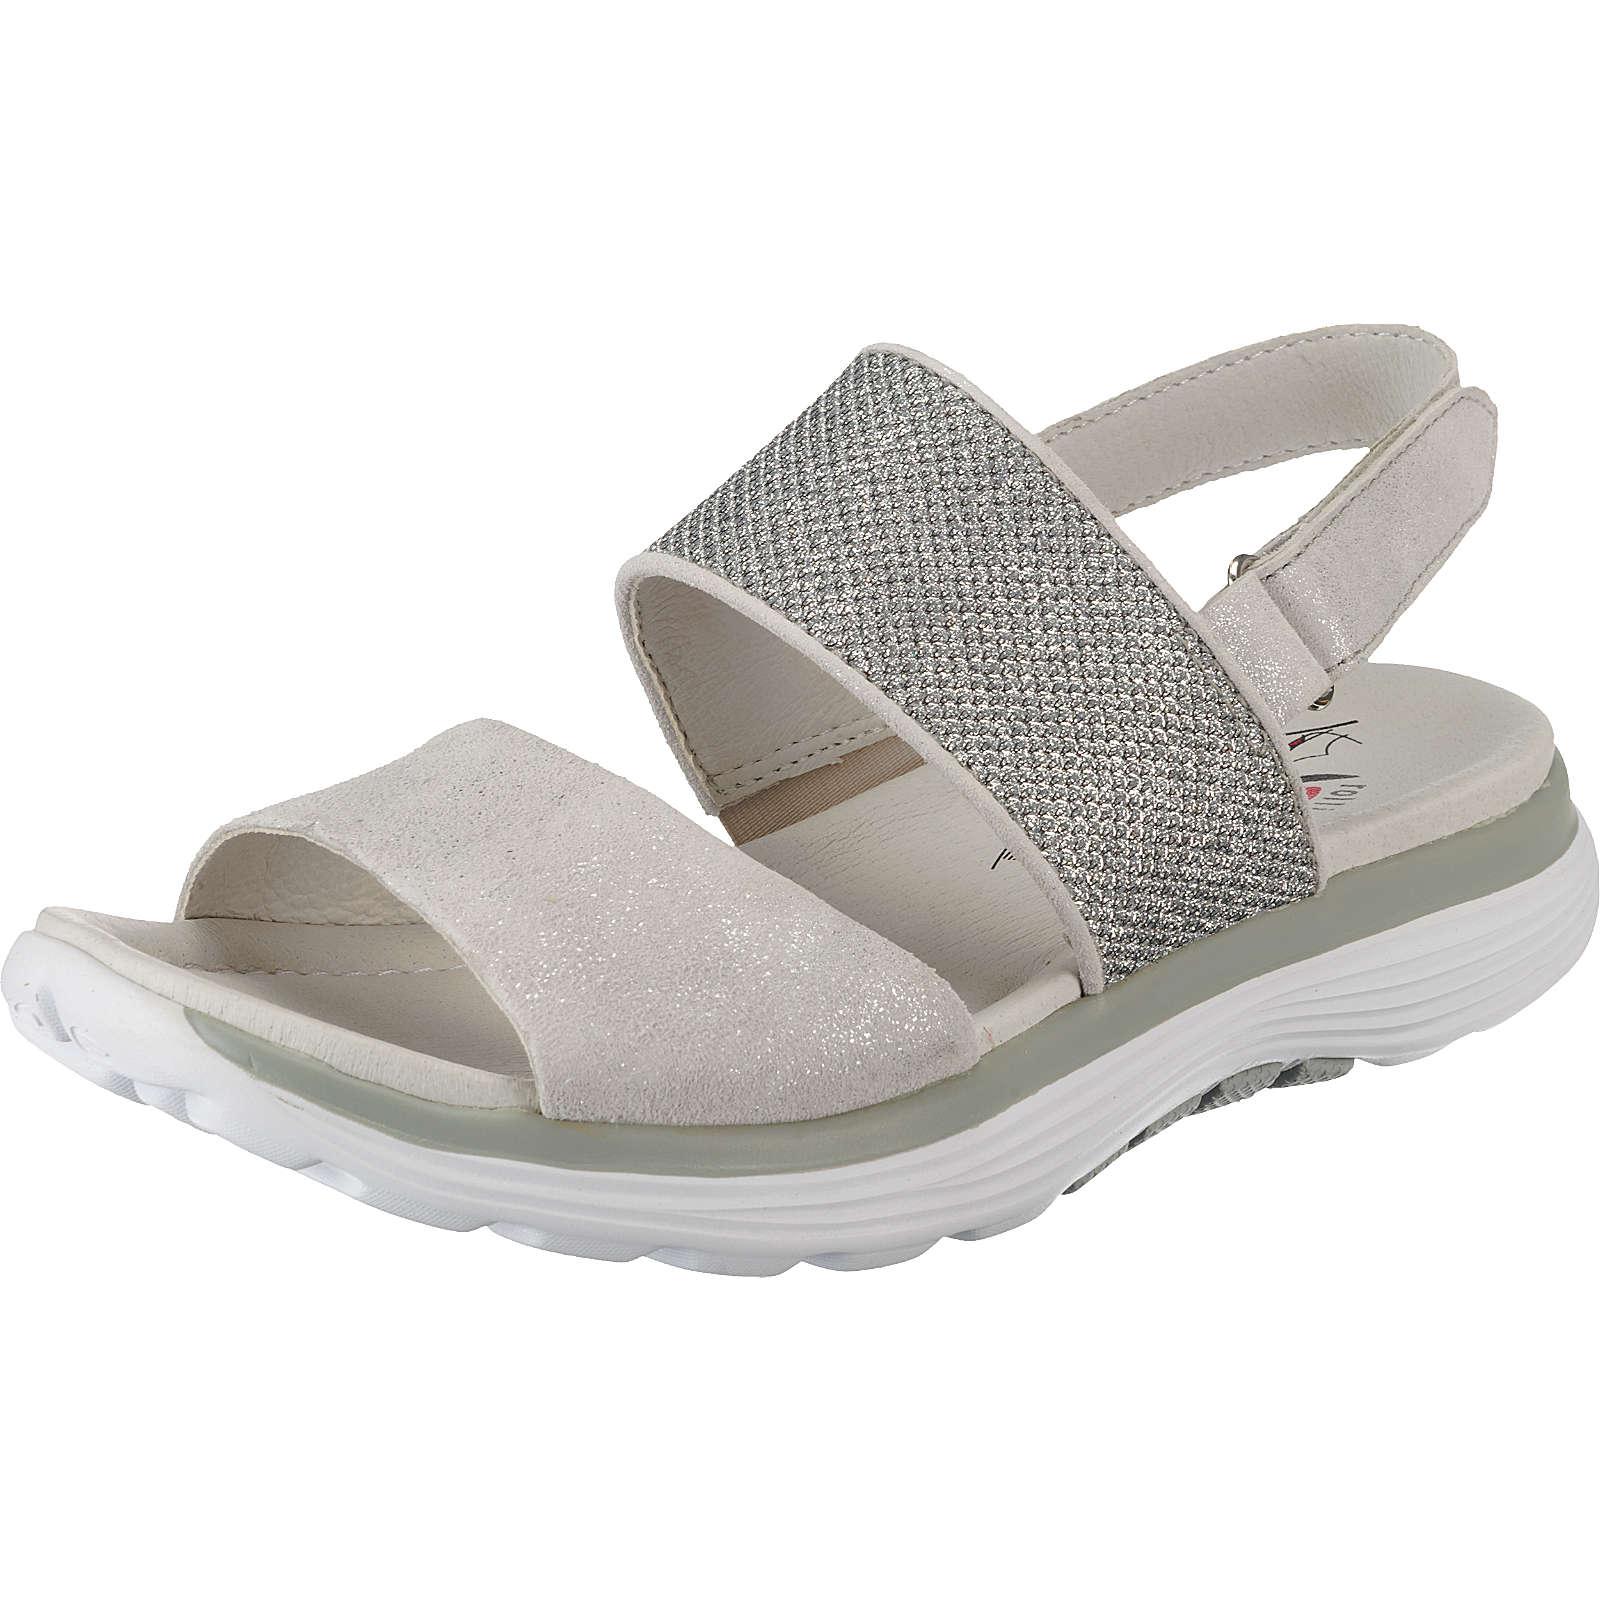 Gabor Klassische Sandalen silber Damen Gr. 42